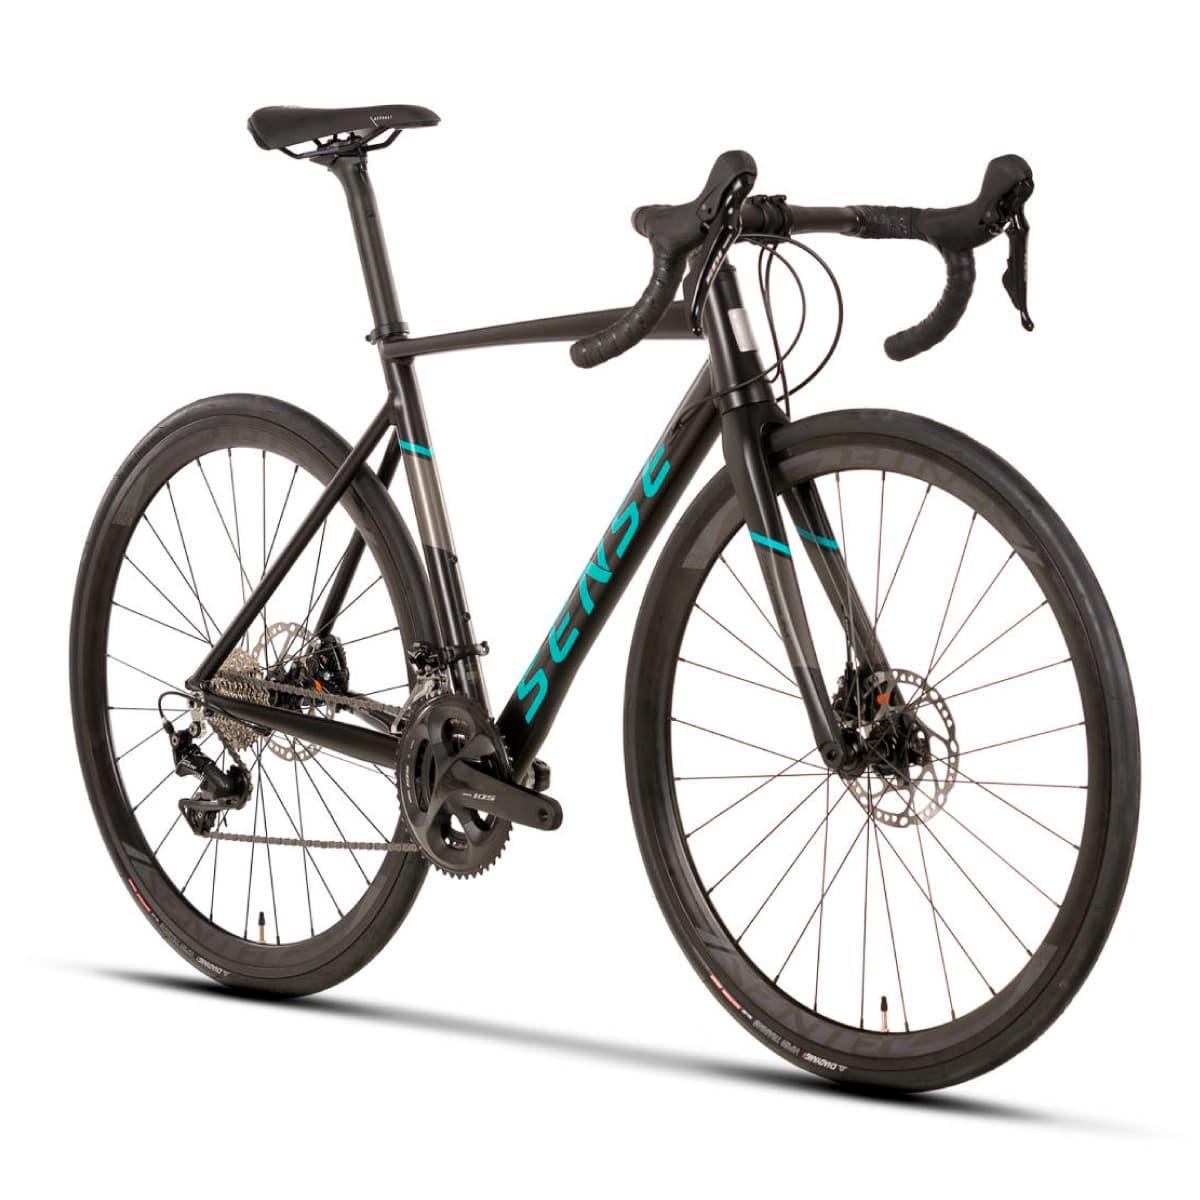 Bike Sense Criterium Factory 2020 Shimano 2x11v Aro 700 Freio Hidráulico